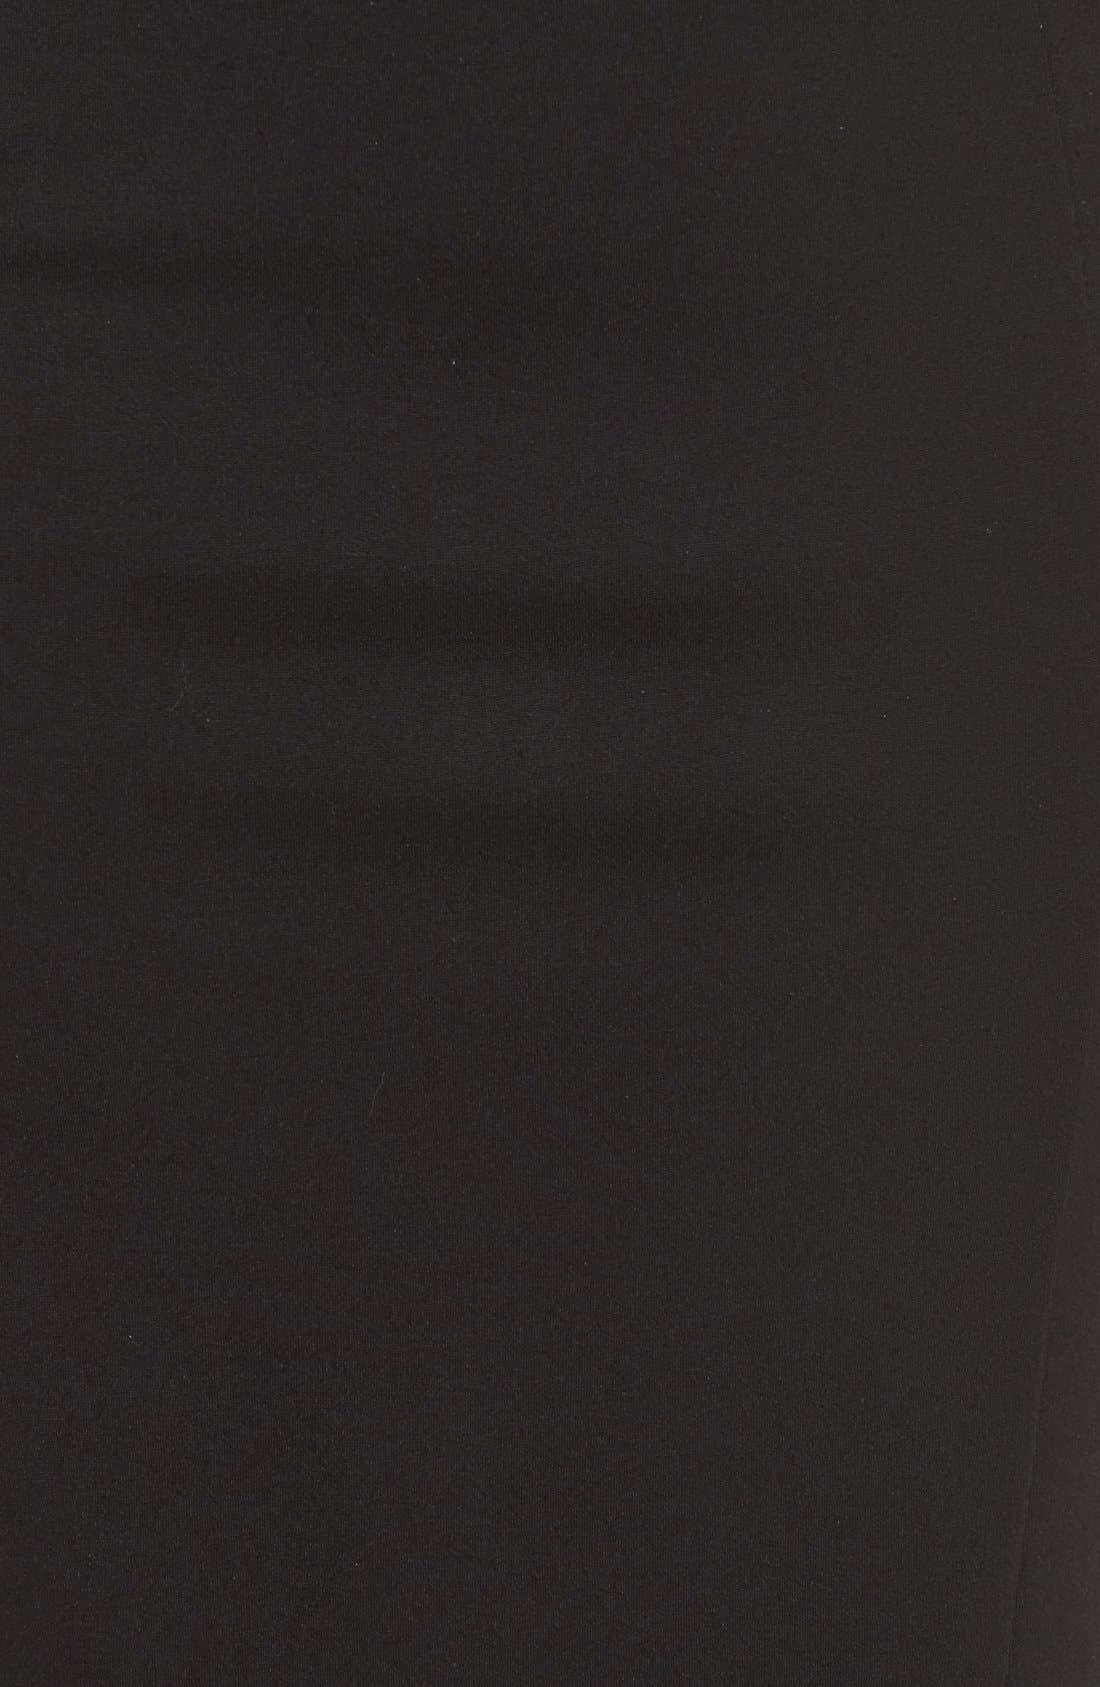 Stretch Sheath Dress,                             Alternate thumbnail 2, color,                             001